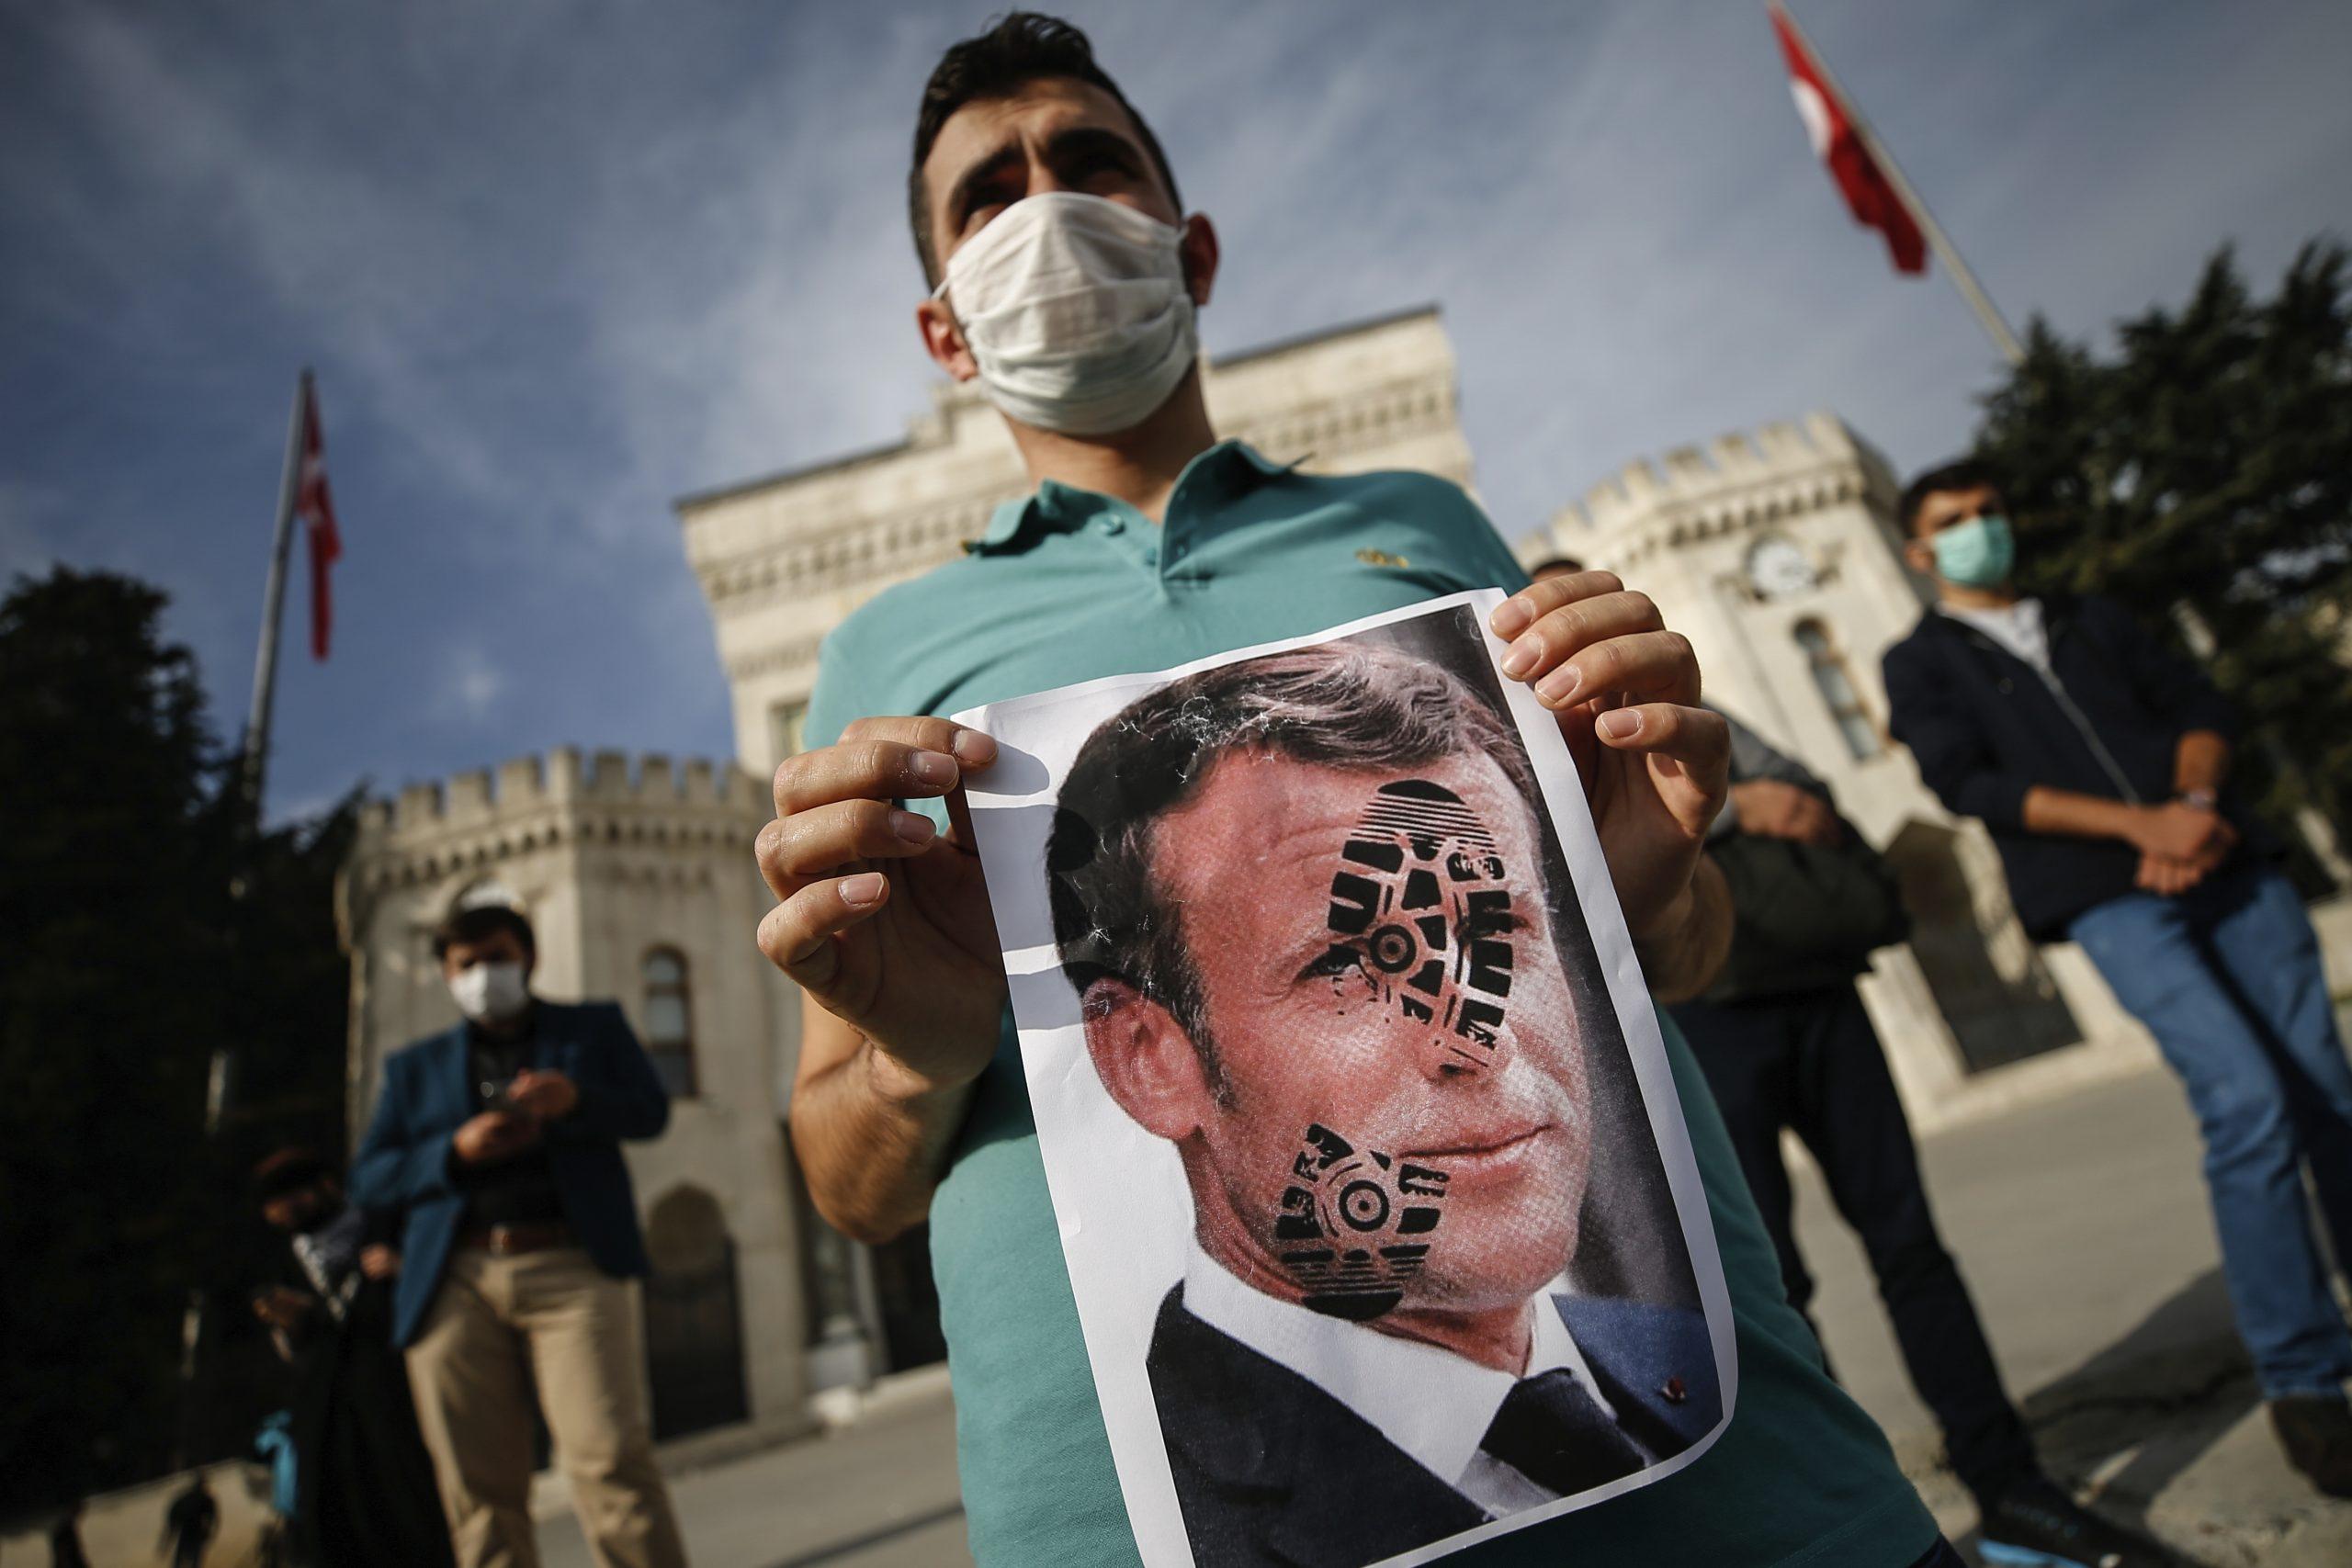 Erdogan-Anhänger protestieren gegen Macron